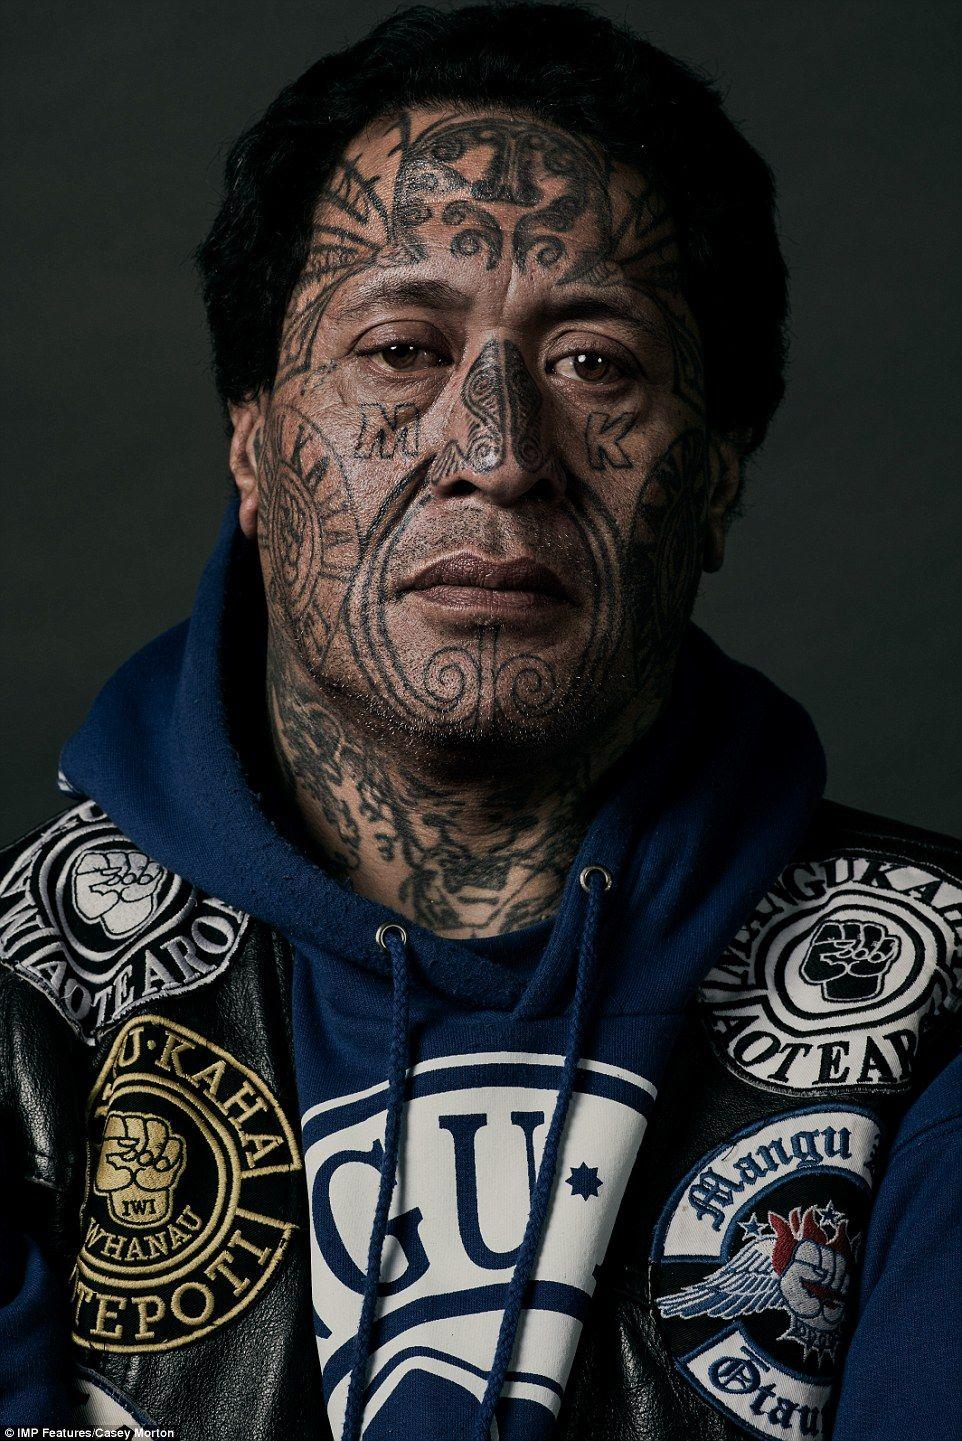 Striking portraits of Black Power offer rare glimpse into